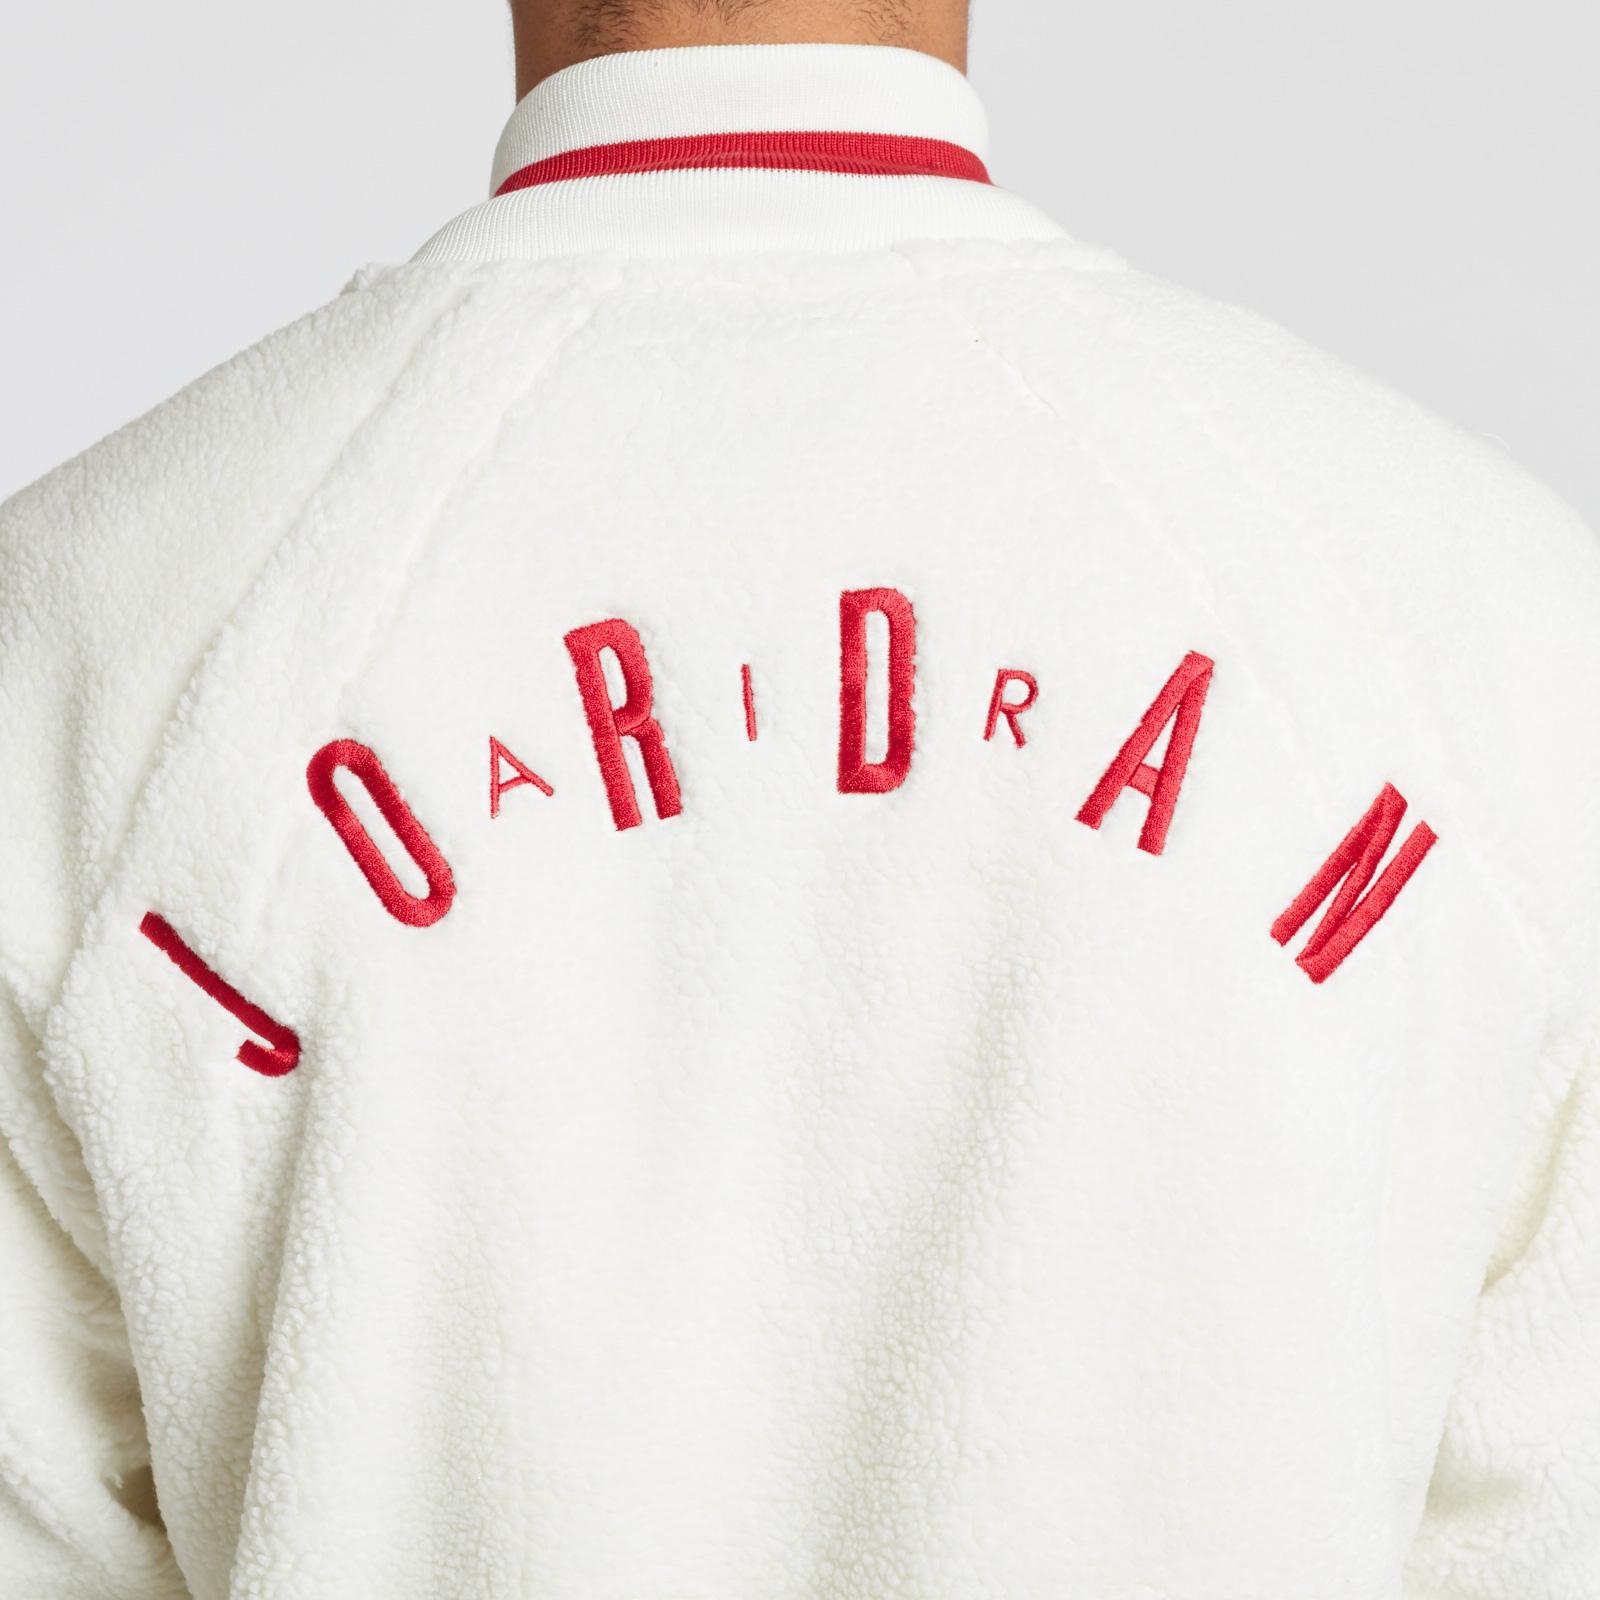 80c91955a61904 Jordan Brand Shearling AJ1 Fleece Jacket - Ah9748-133 ...